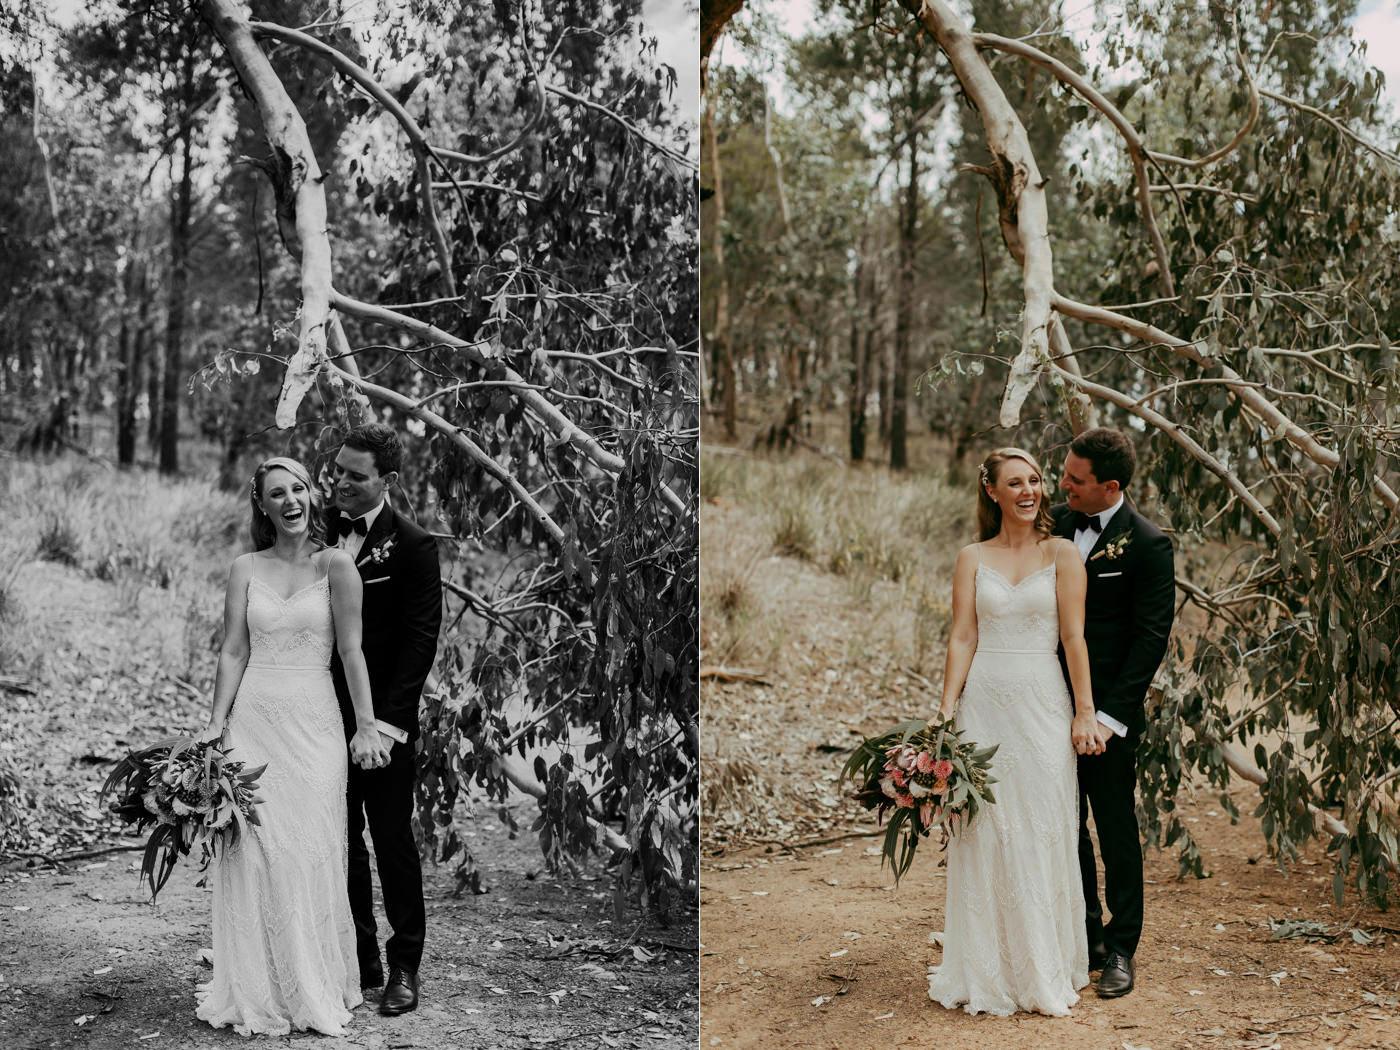 Anthony & Eliet - Wagga Wagga Wedding - Country NSW - Samantha Heather Photography-59.jpg